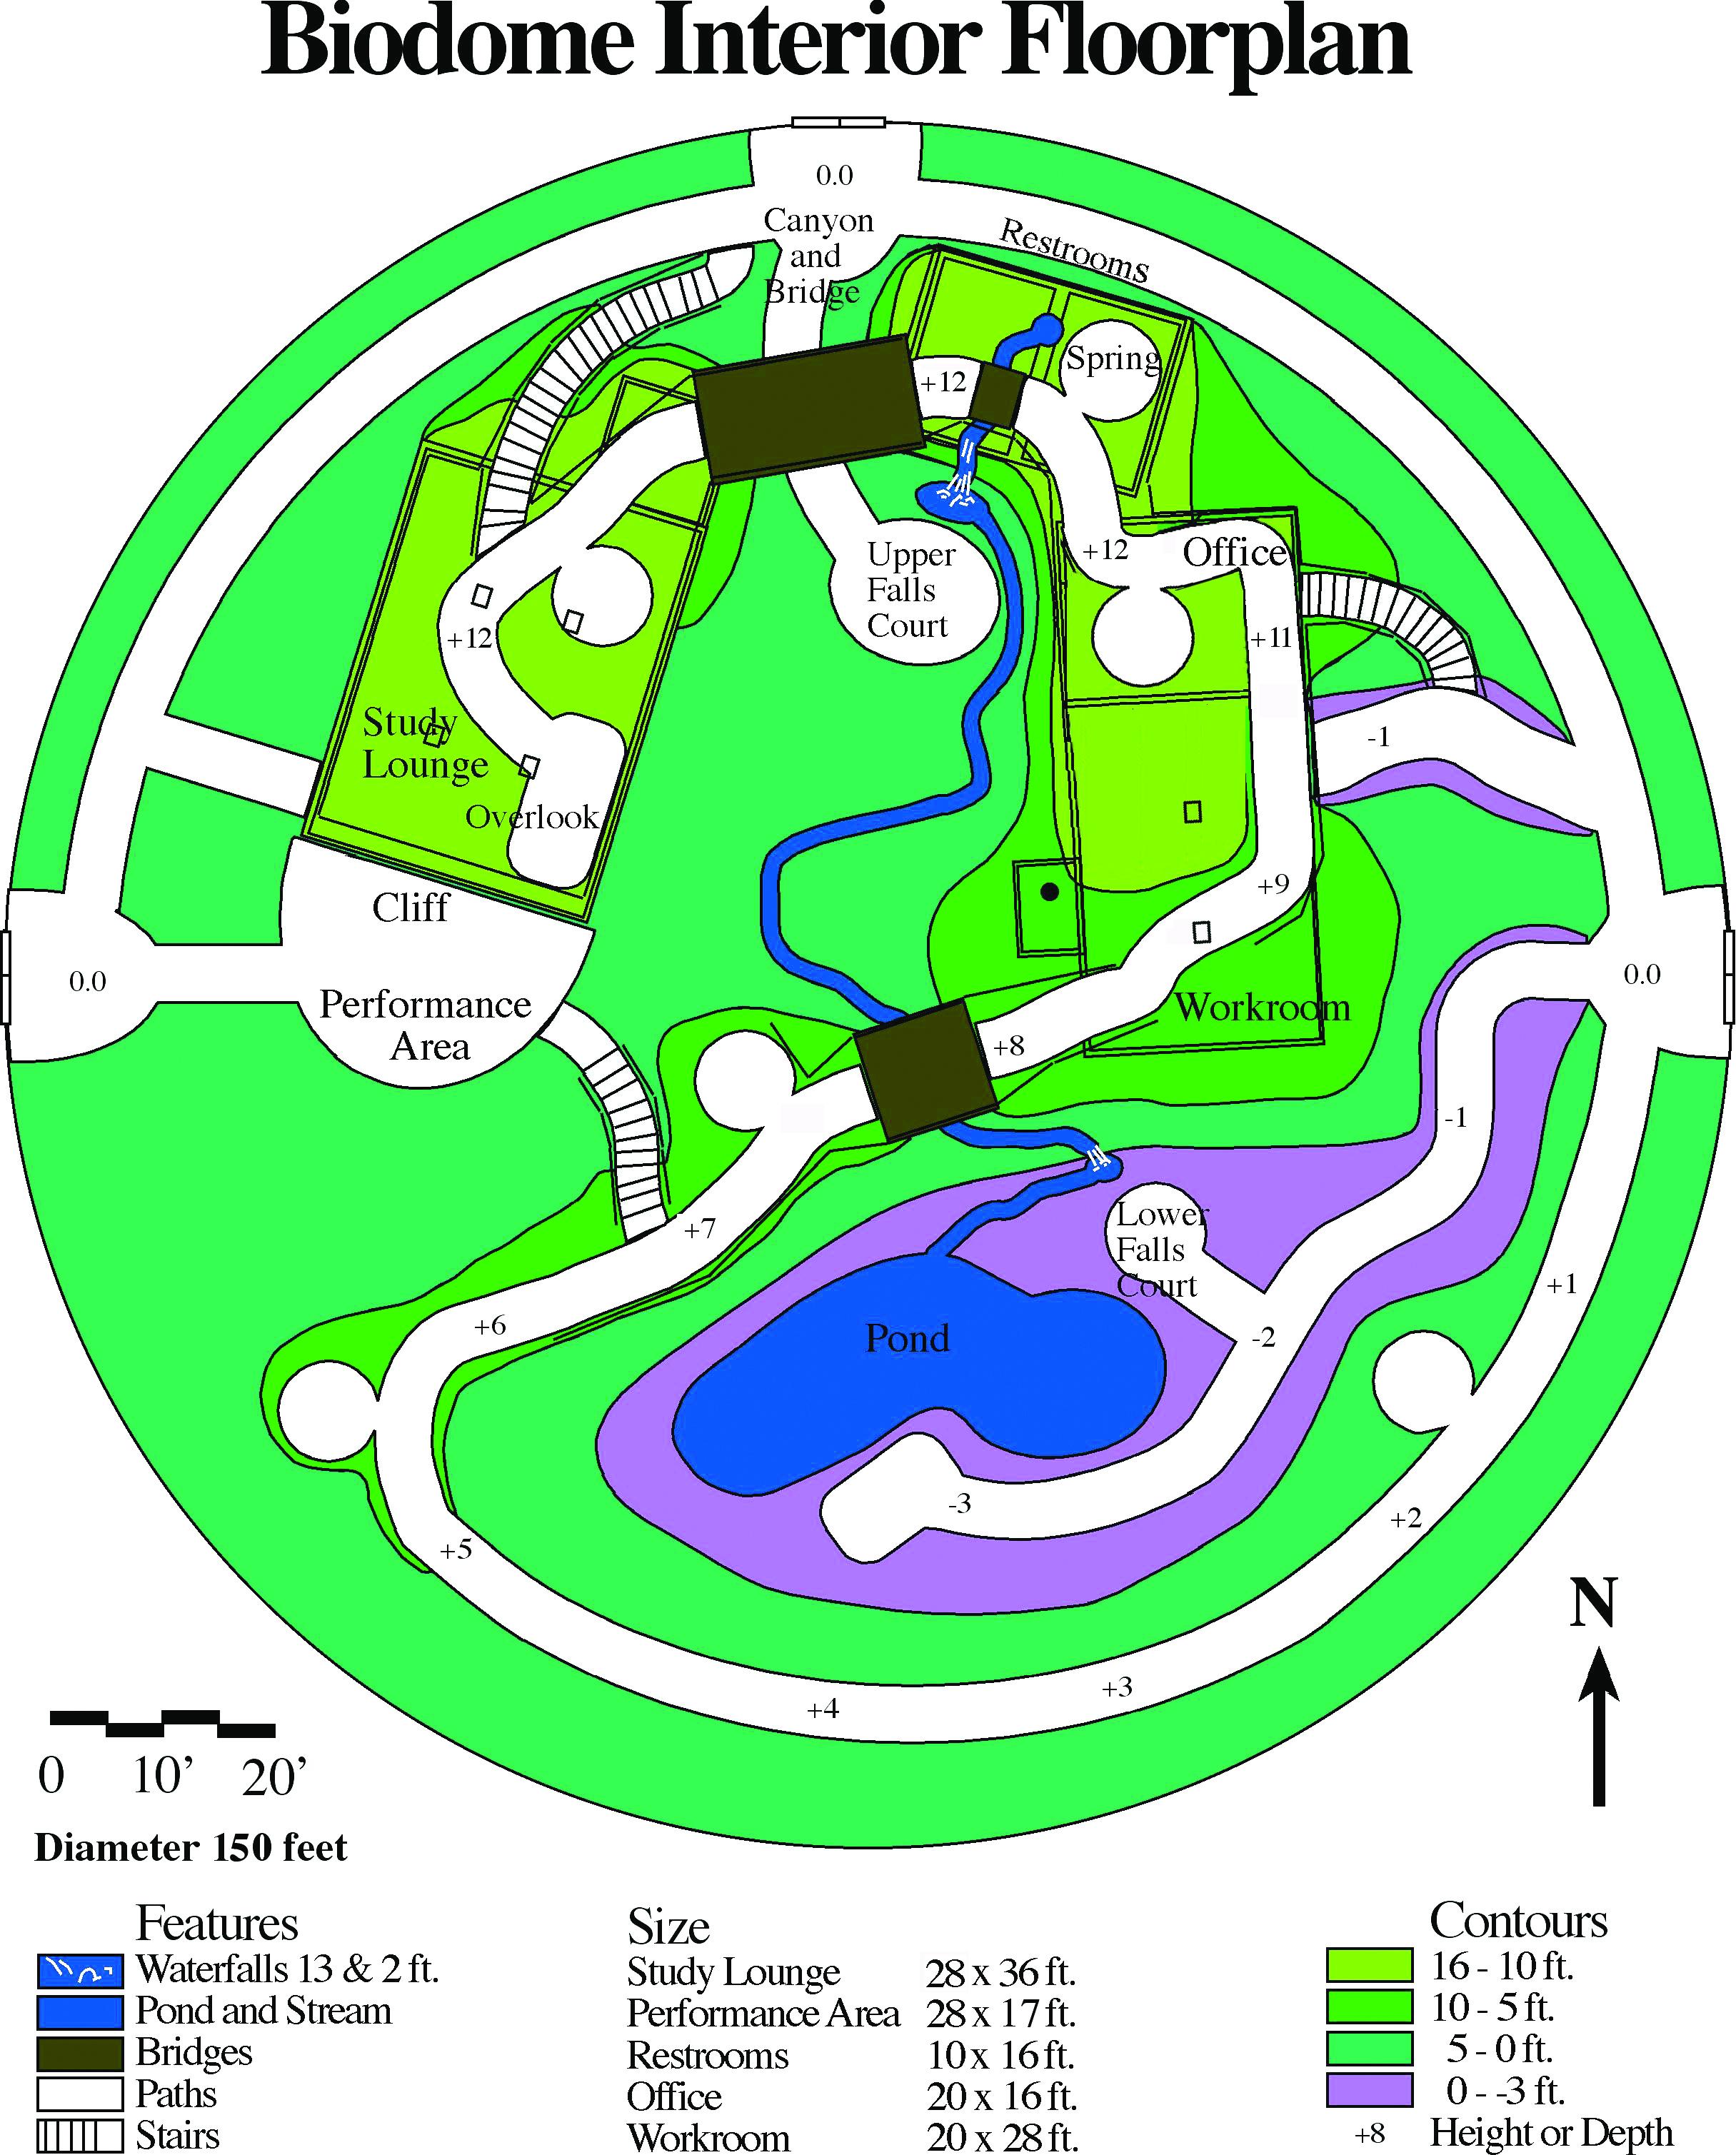 Biodome Floorplan